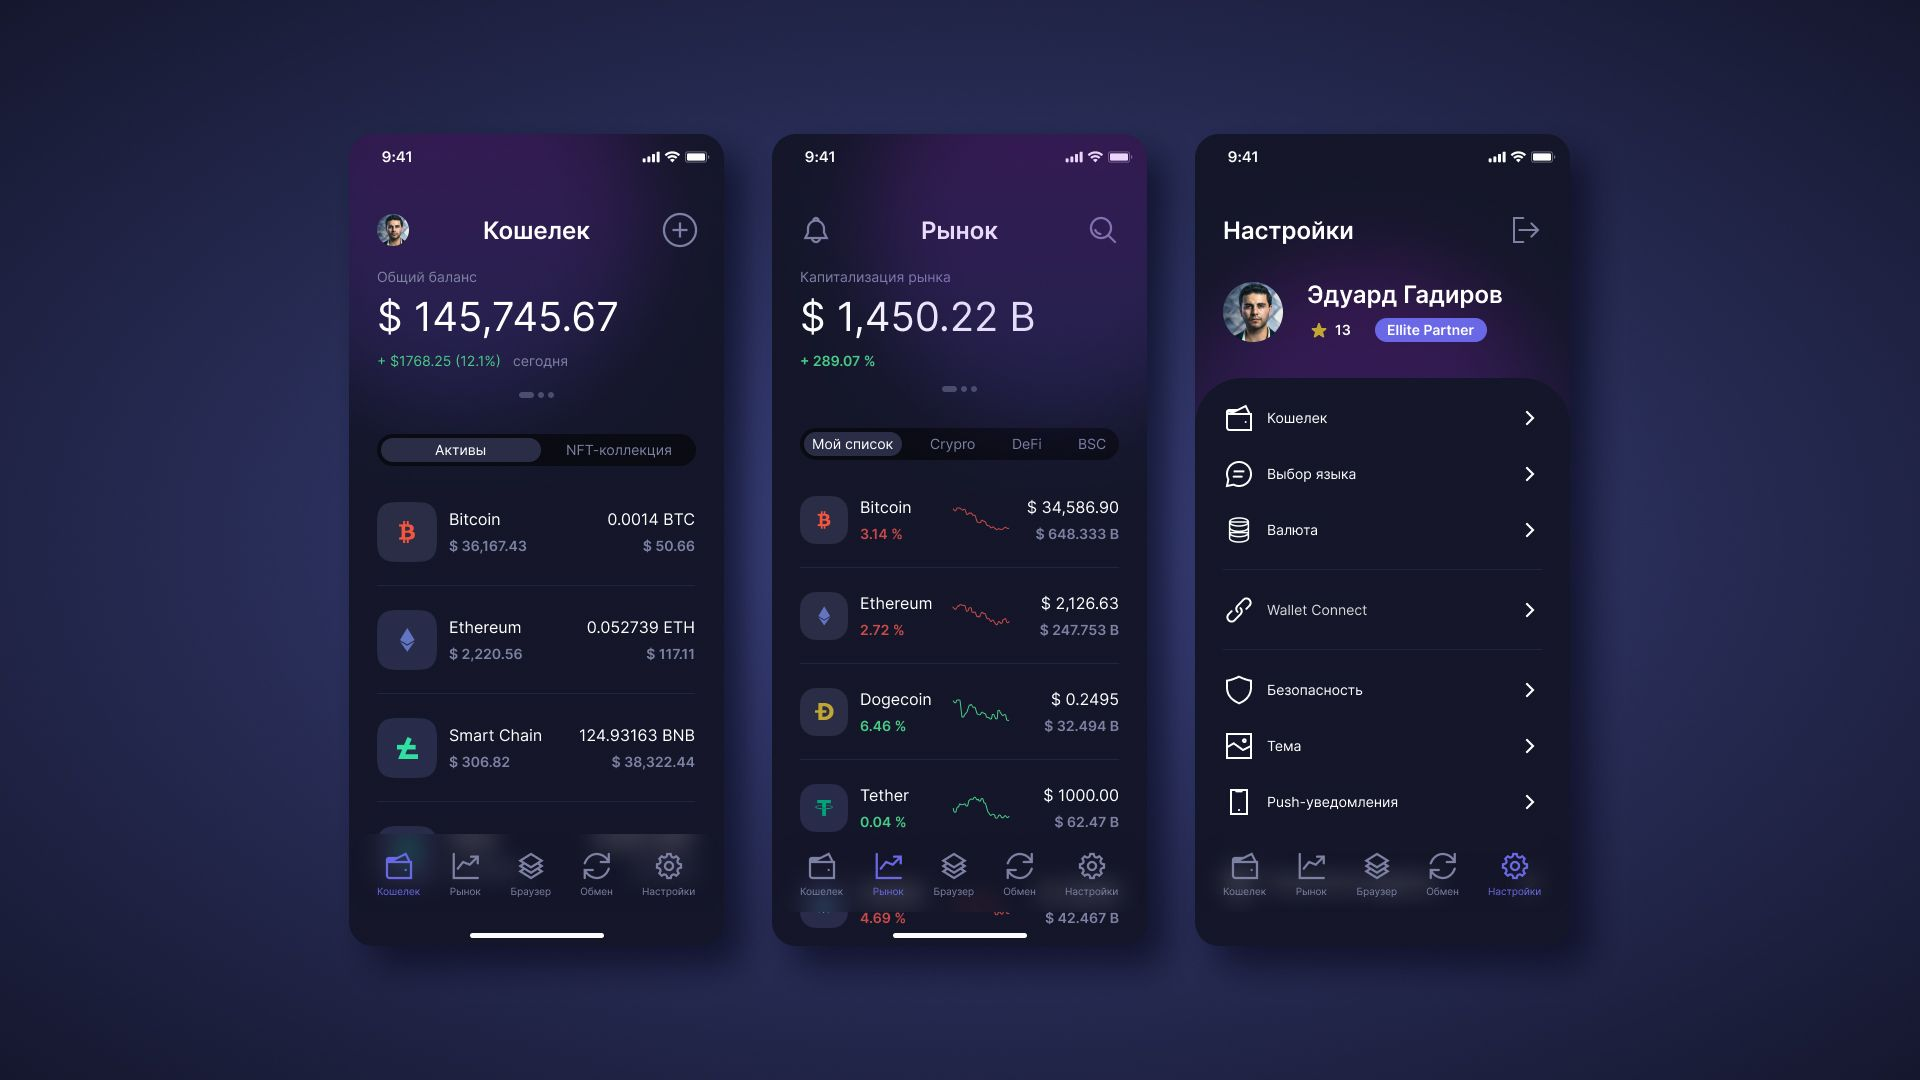 Криптовалютный кошелек Wise Win - дизайнер ilya_sk